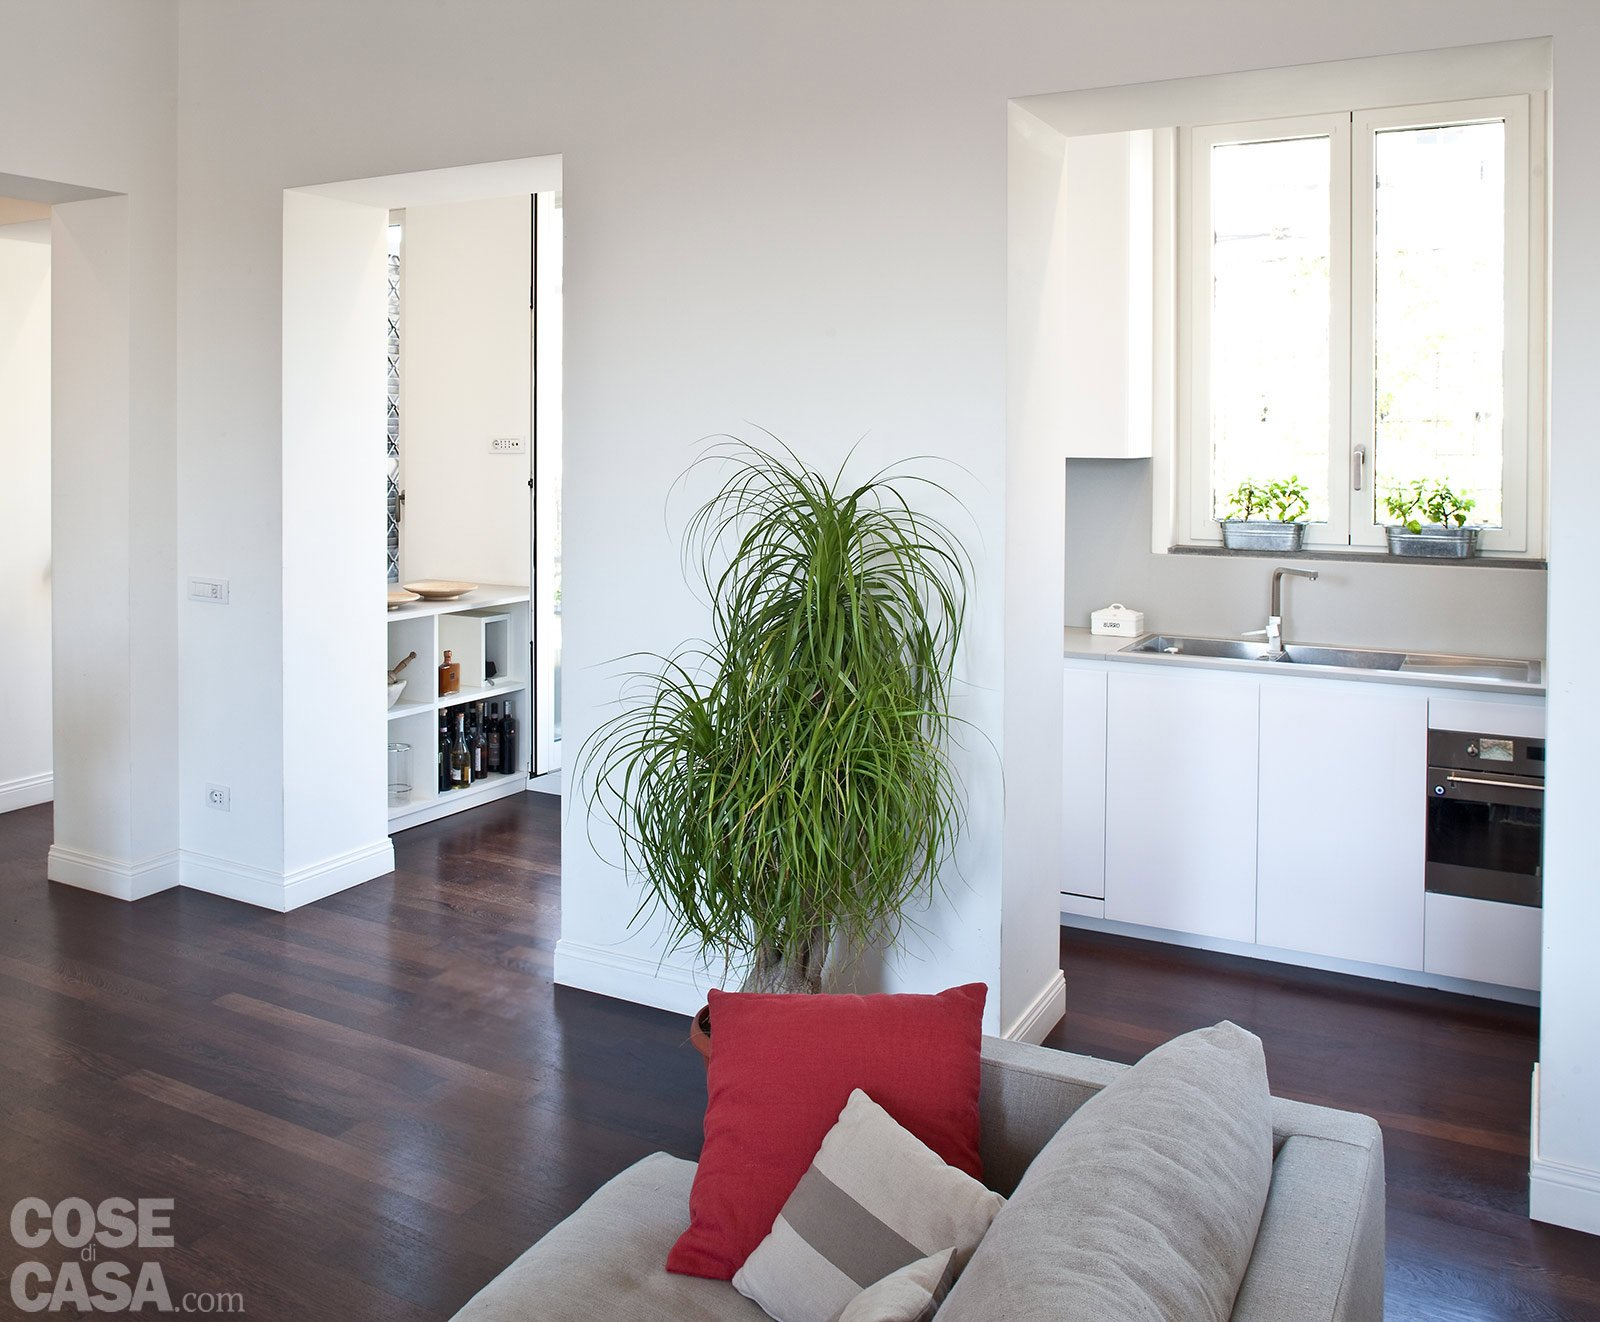 Casa 14 mq in pi per il bilocale cose di casa for Generatore di design di casa